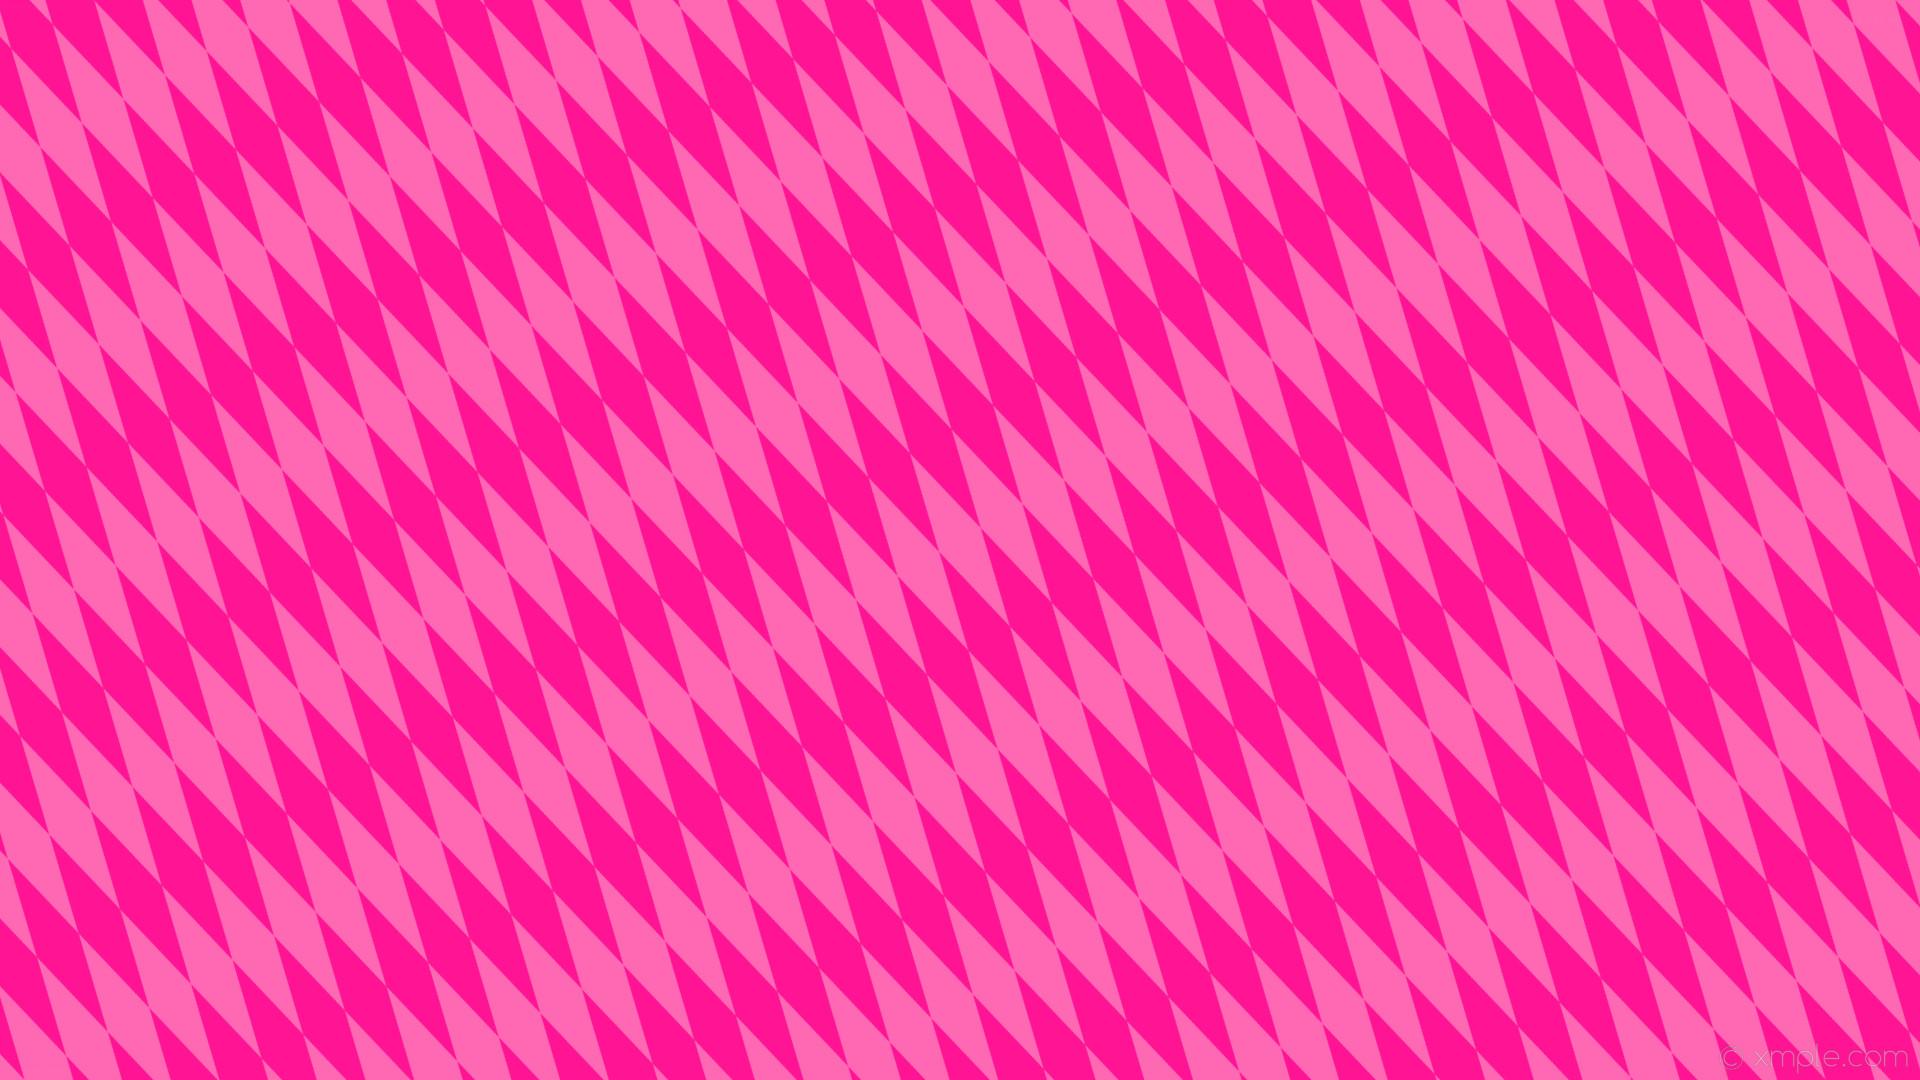 wallpaper pink diamond lozenge rhombus hot pink deep pink #ff69b4 #ff1493  120° 200px